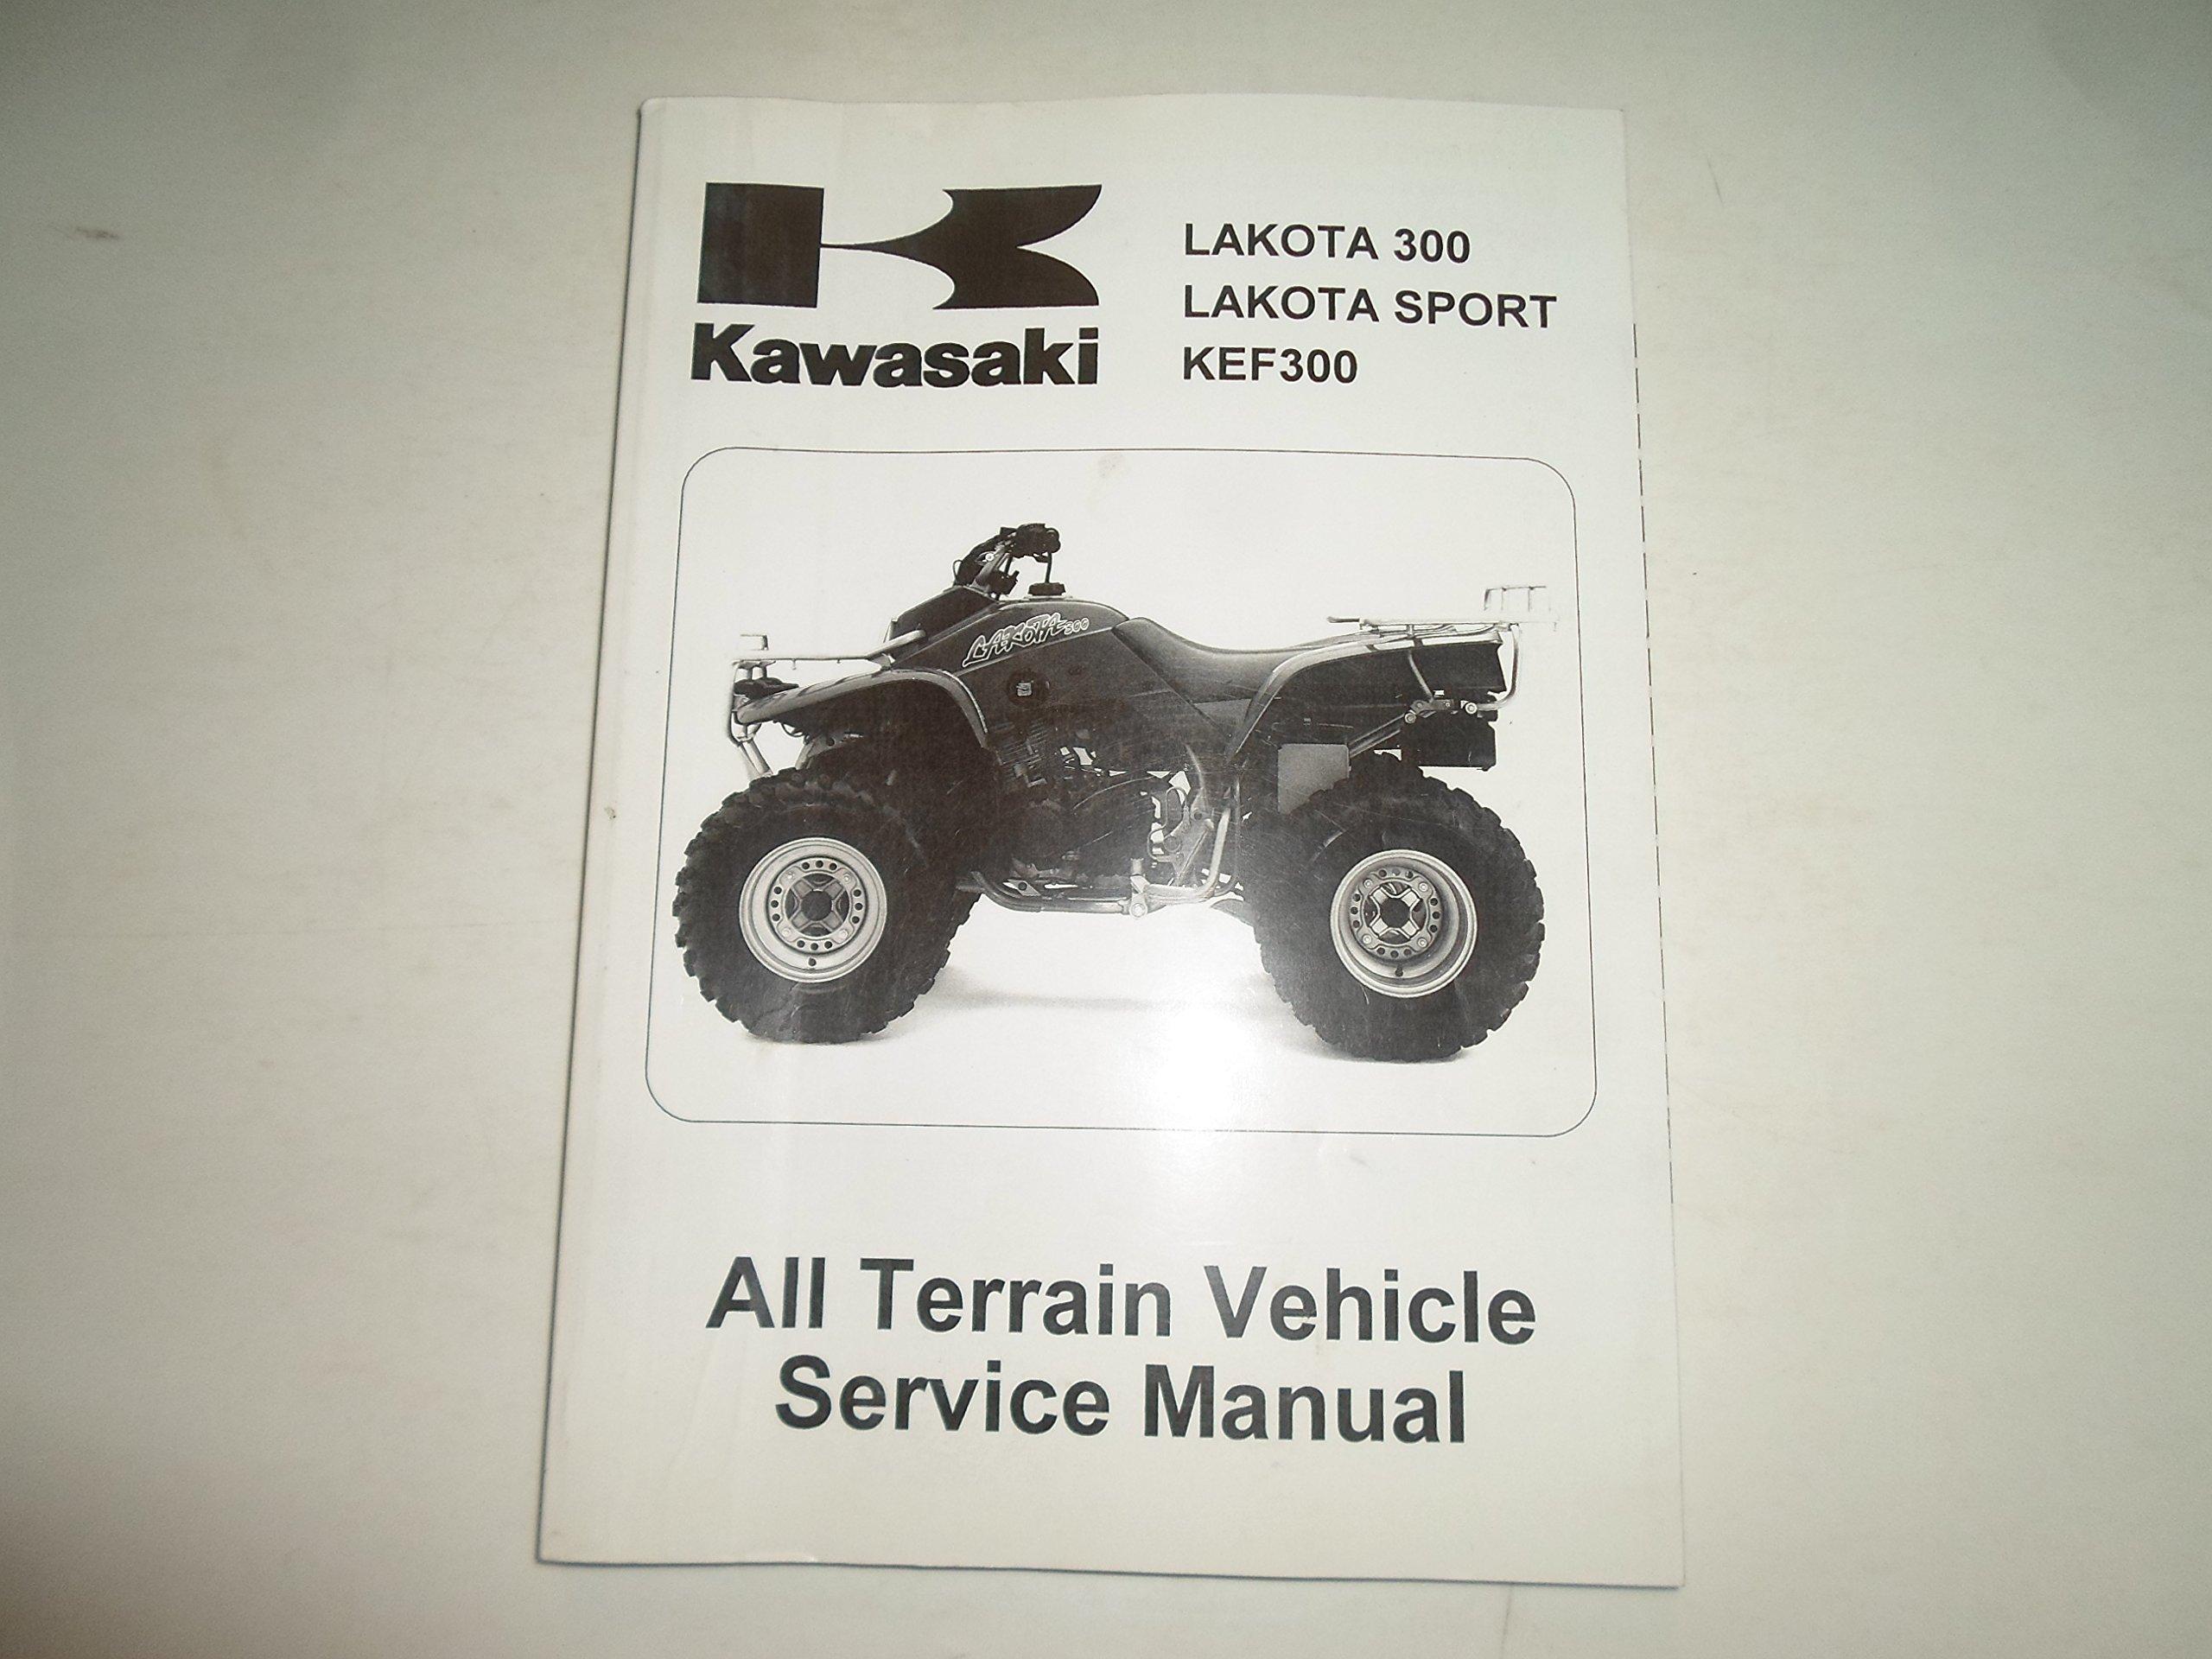 1995 2004 Kawasaki Lakota 300 Sport KEF300 ATV Service Repair Manual WORN  STAIN: KAWASAKI: Amazon.com: Books